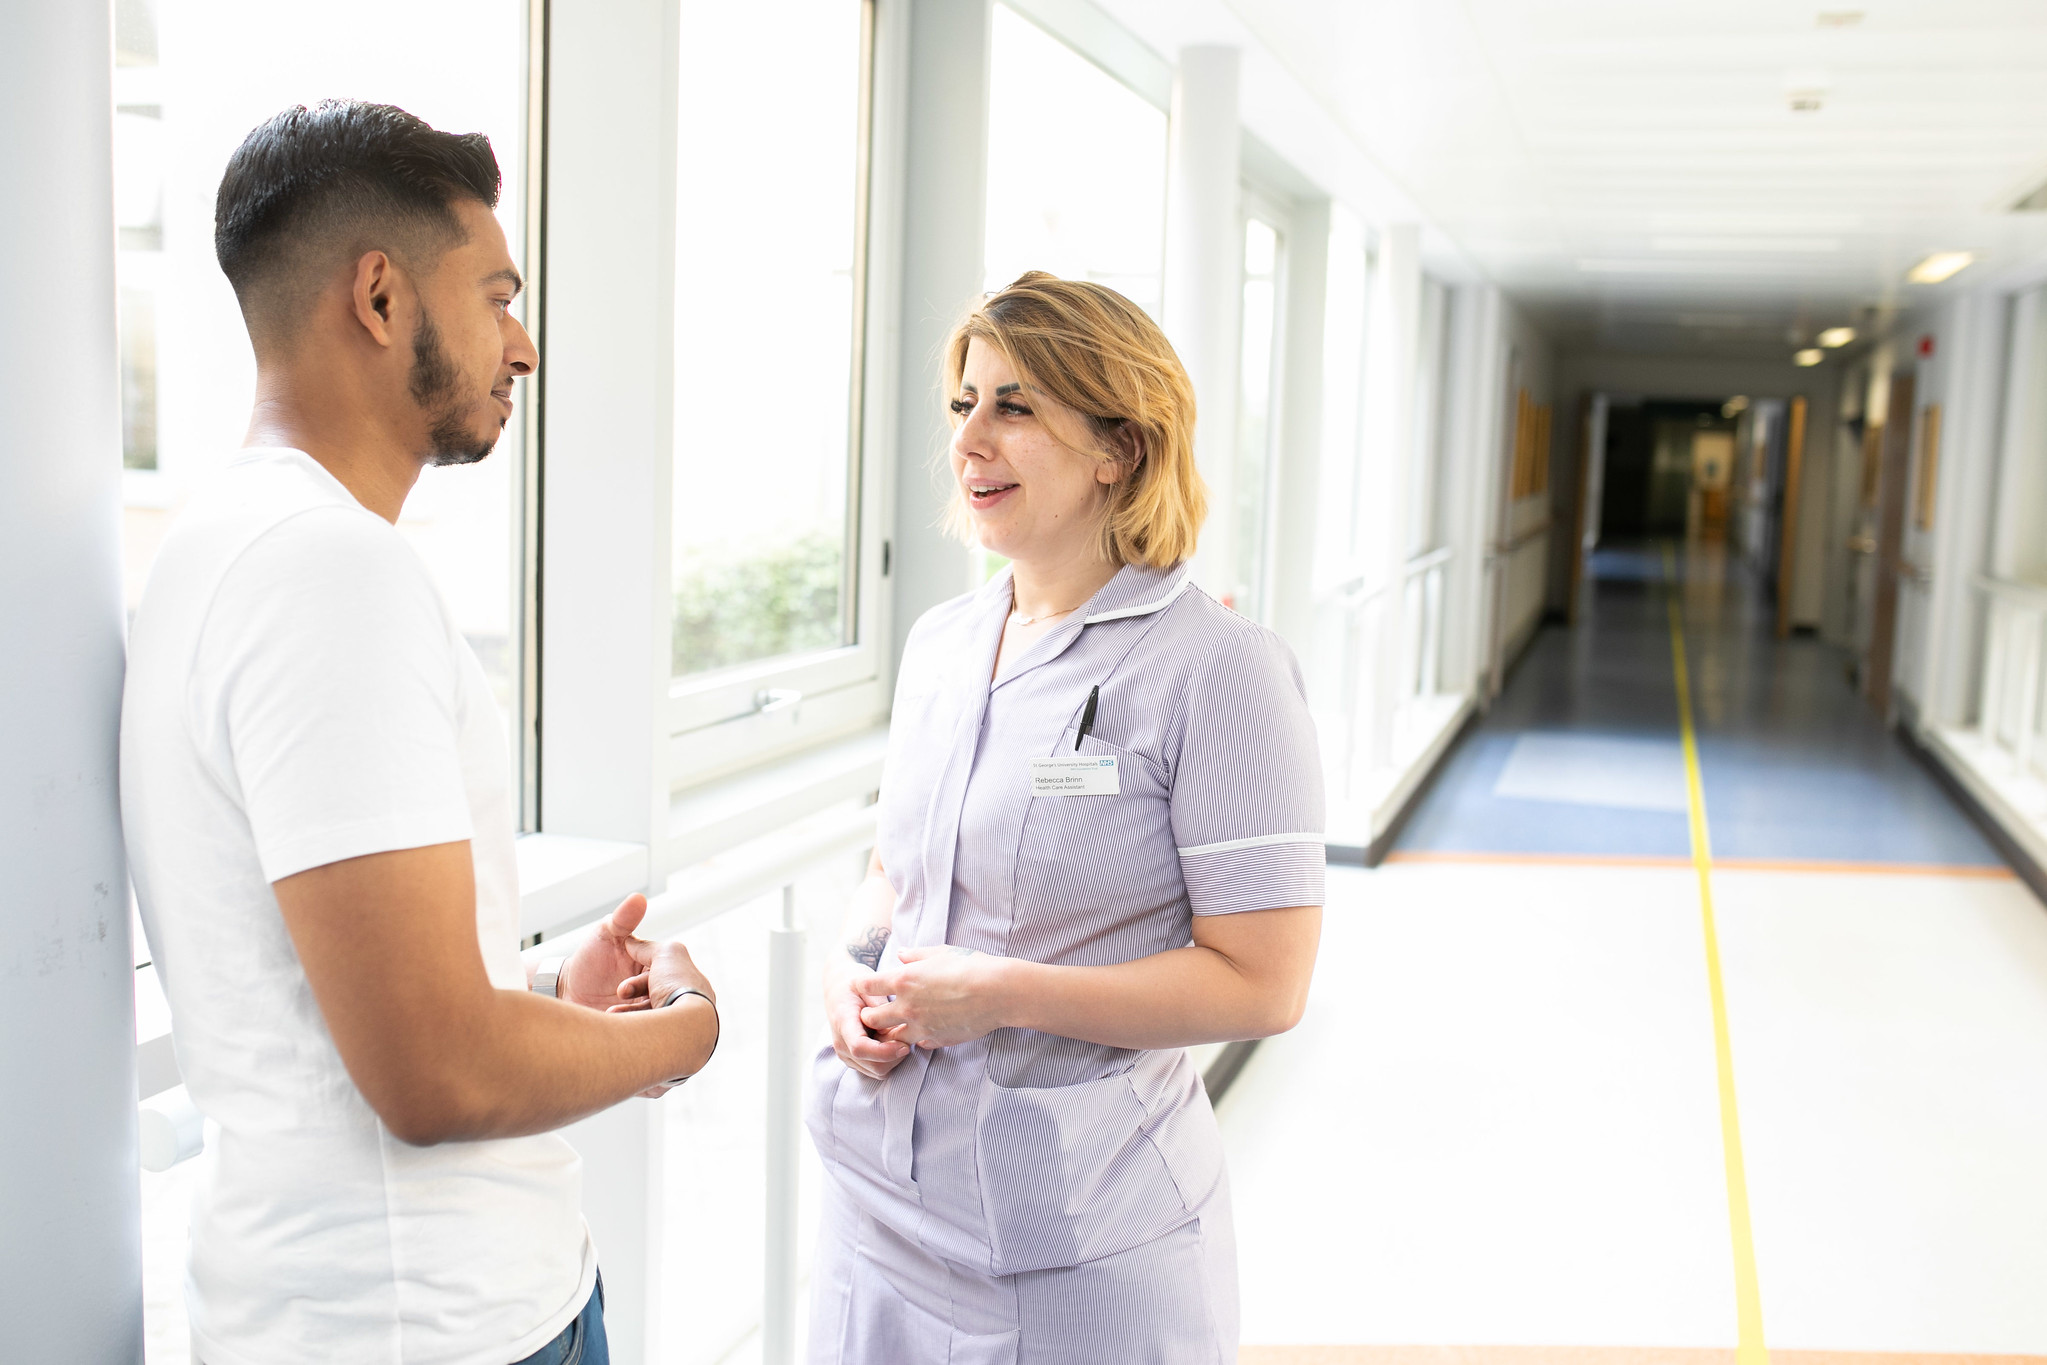 Man talking to a nurse